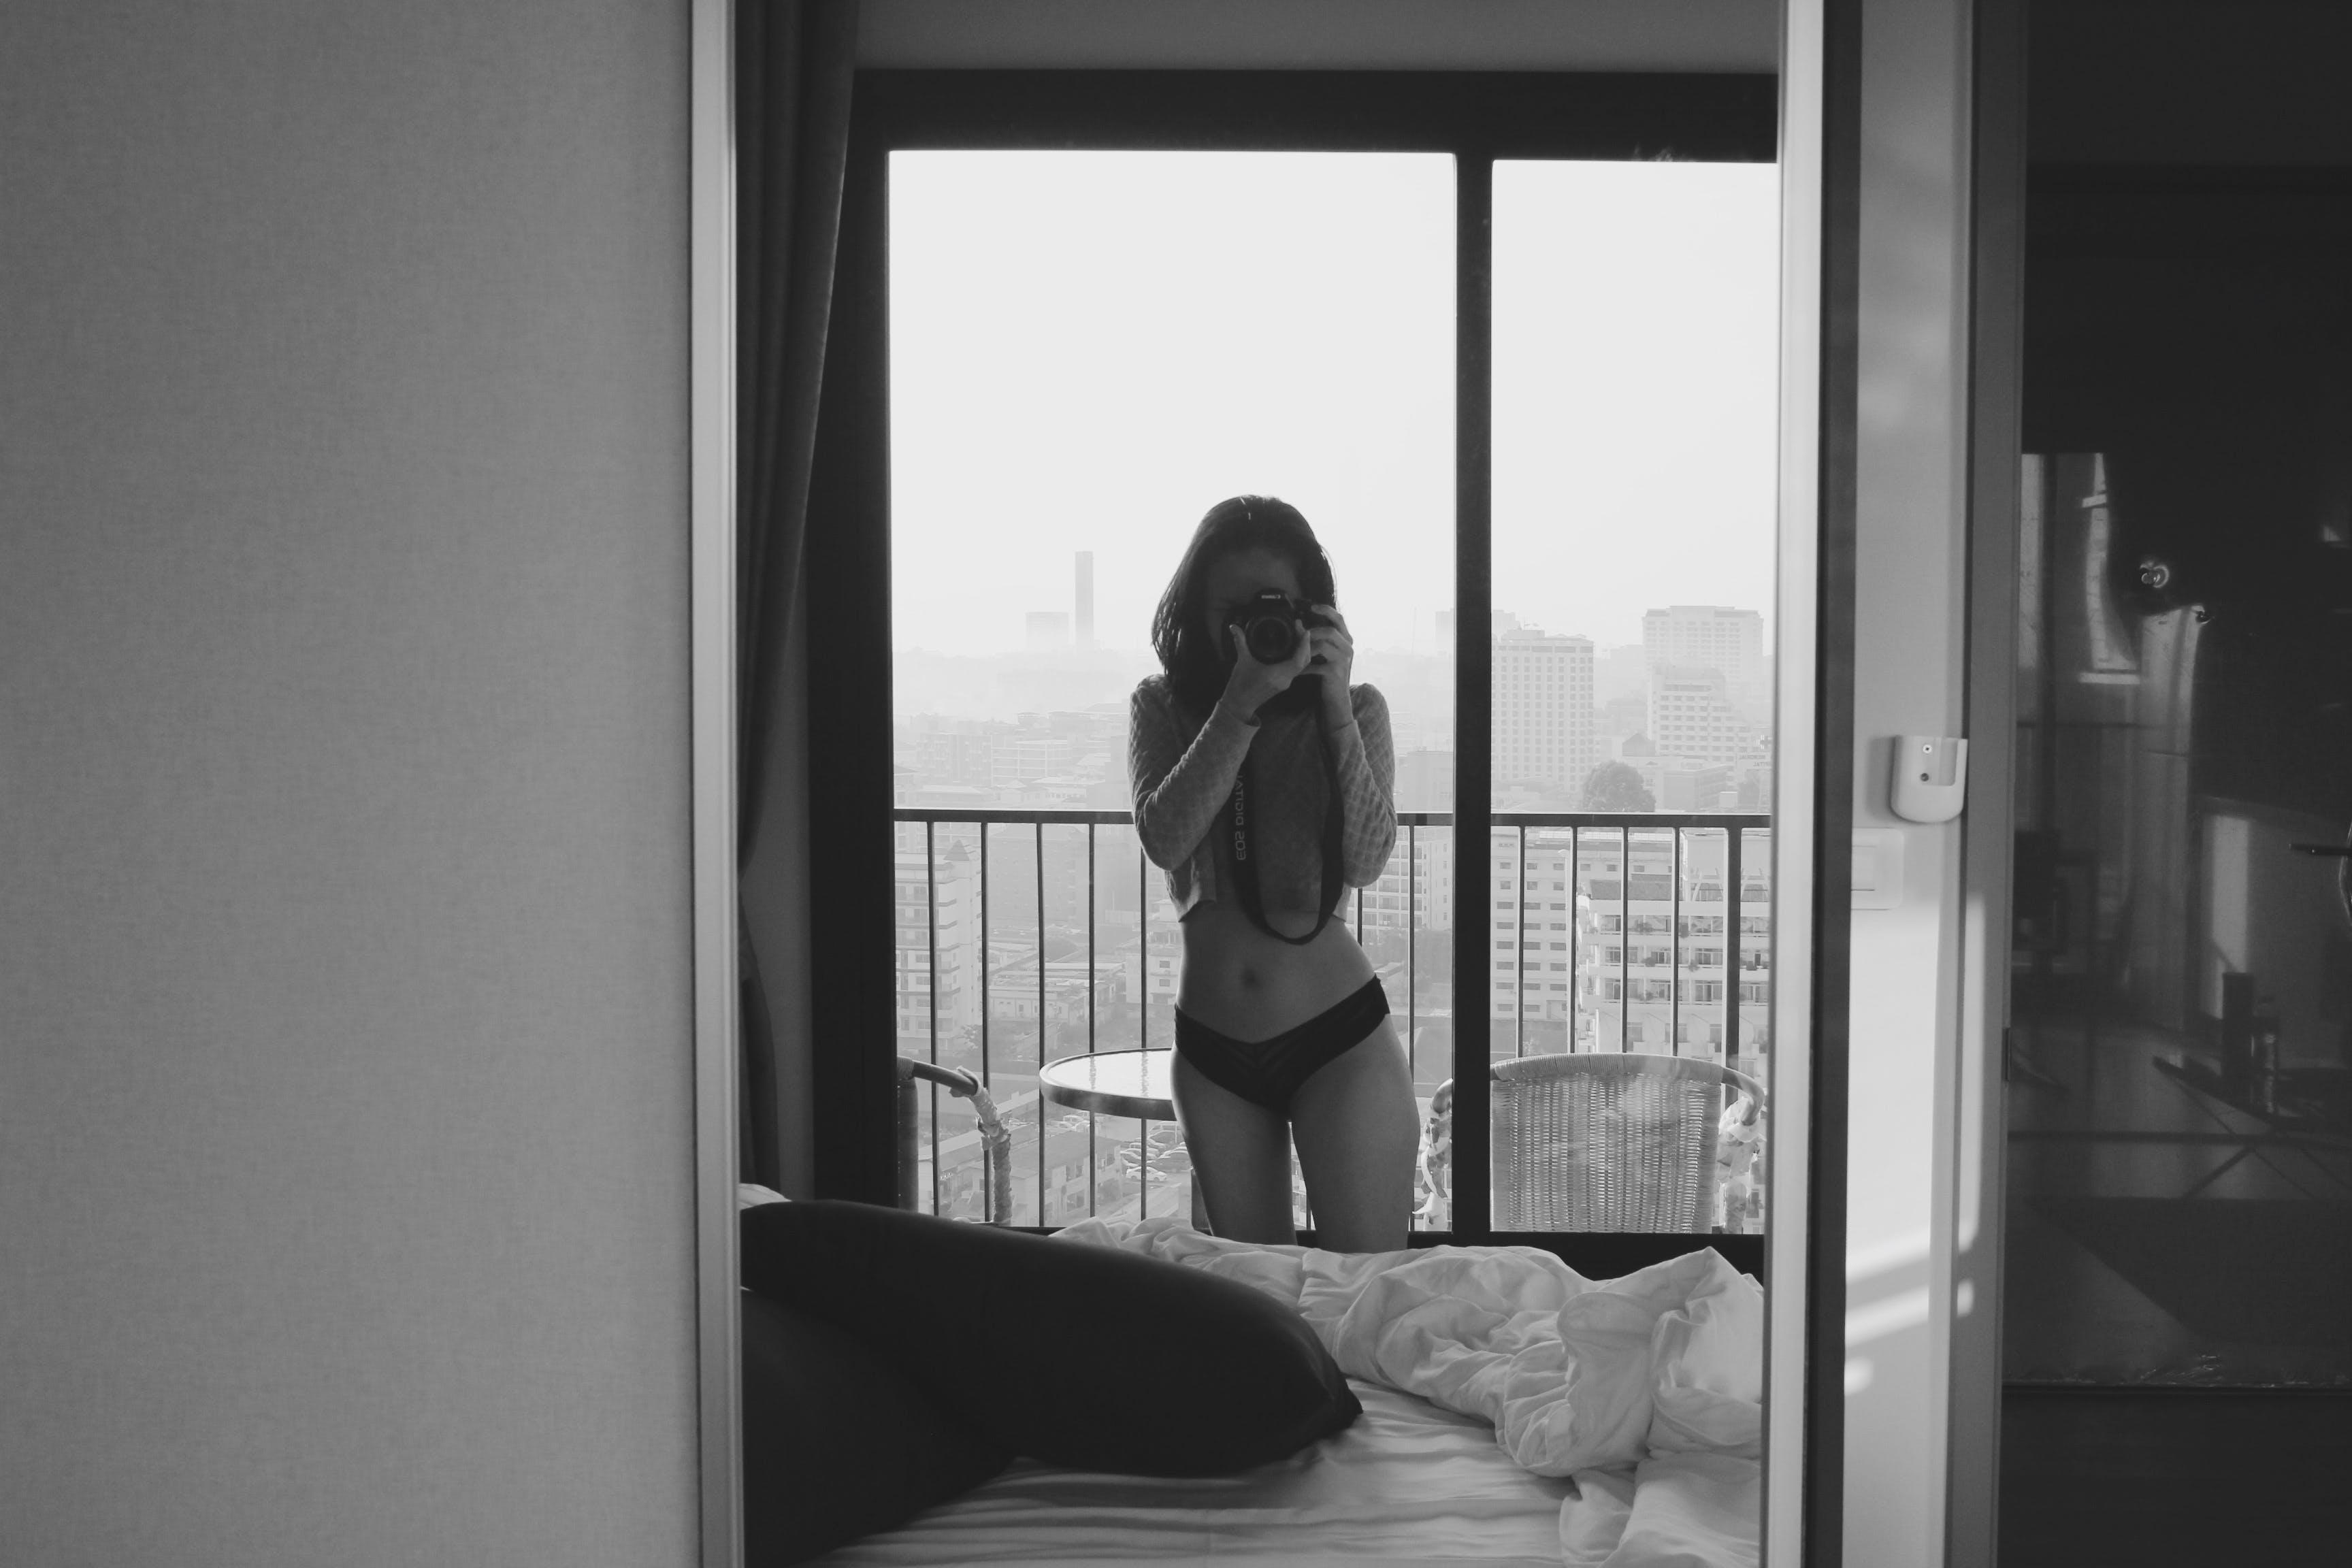 Woman Taking Photo of Herself on Mirror